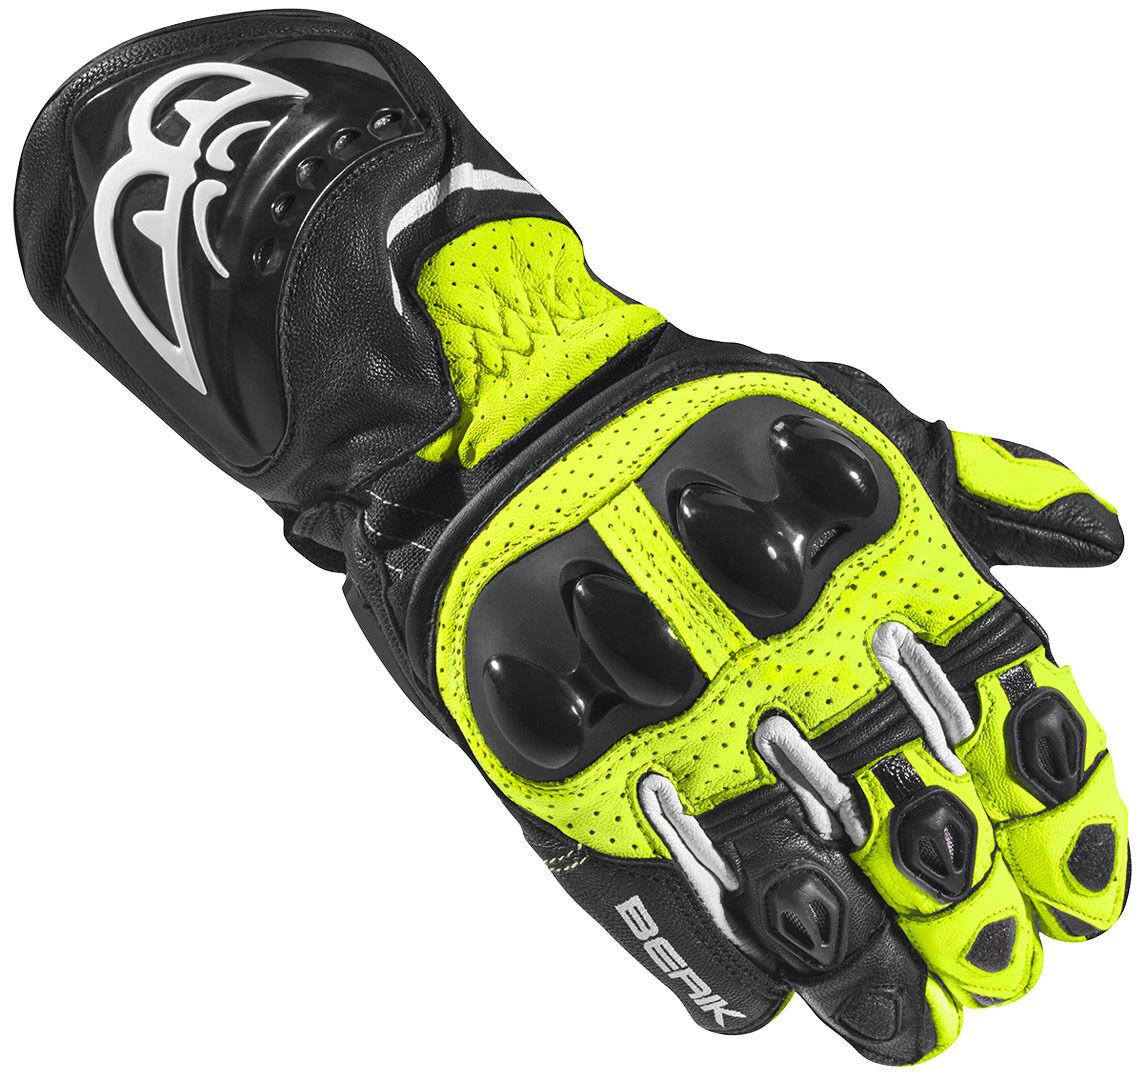 Berik Spa Evo Motorcykel handskar Svart Gul M